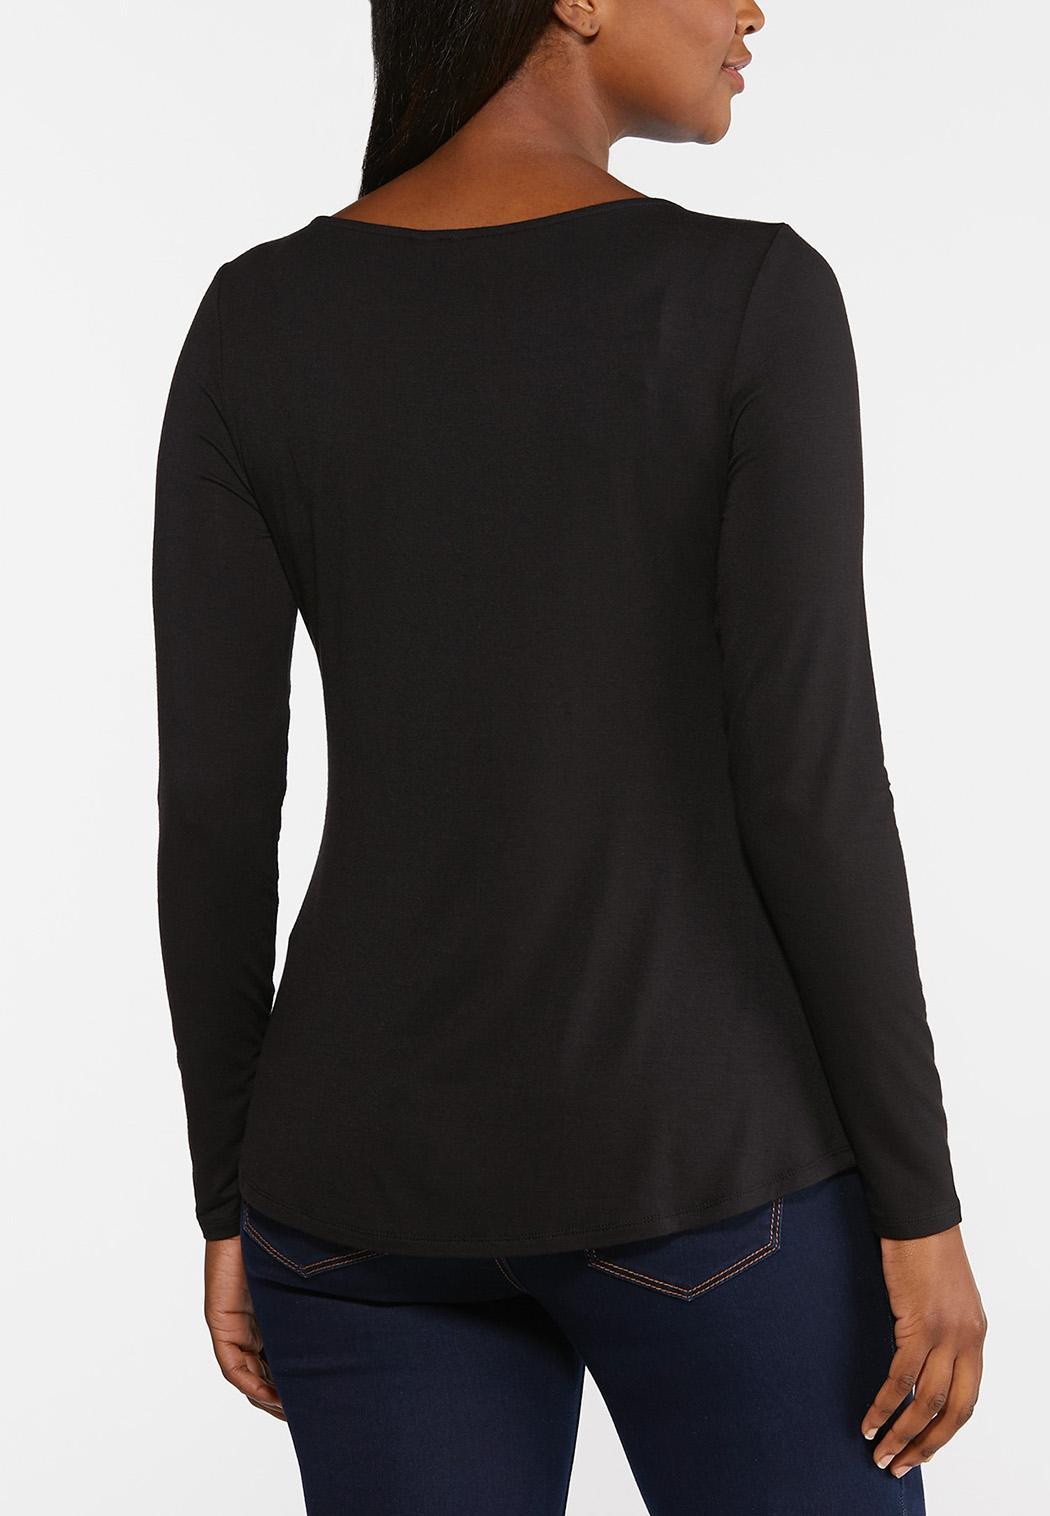 Plus Size Solid Scoop Neck Top (Item #44391763)